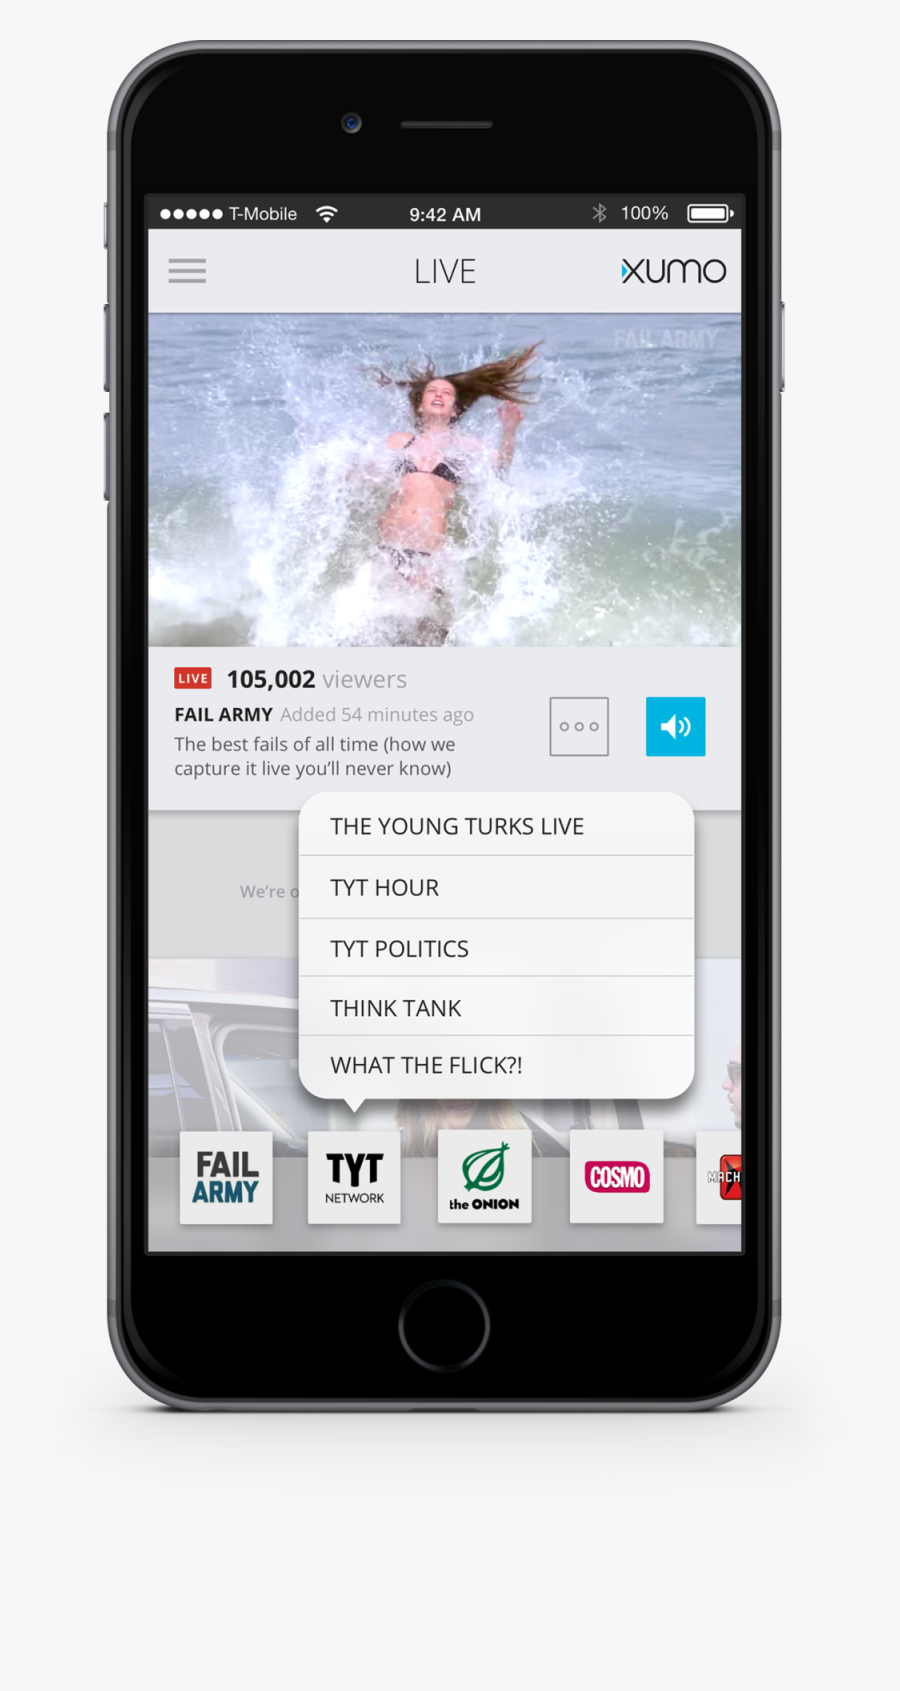 Download Smartphone Network Multimedia - Smartphone, Transparent Clipart